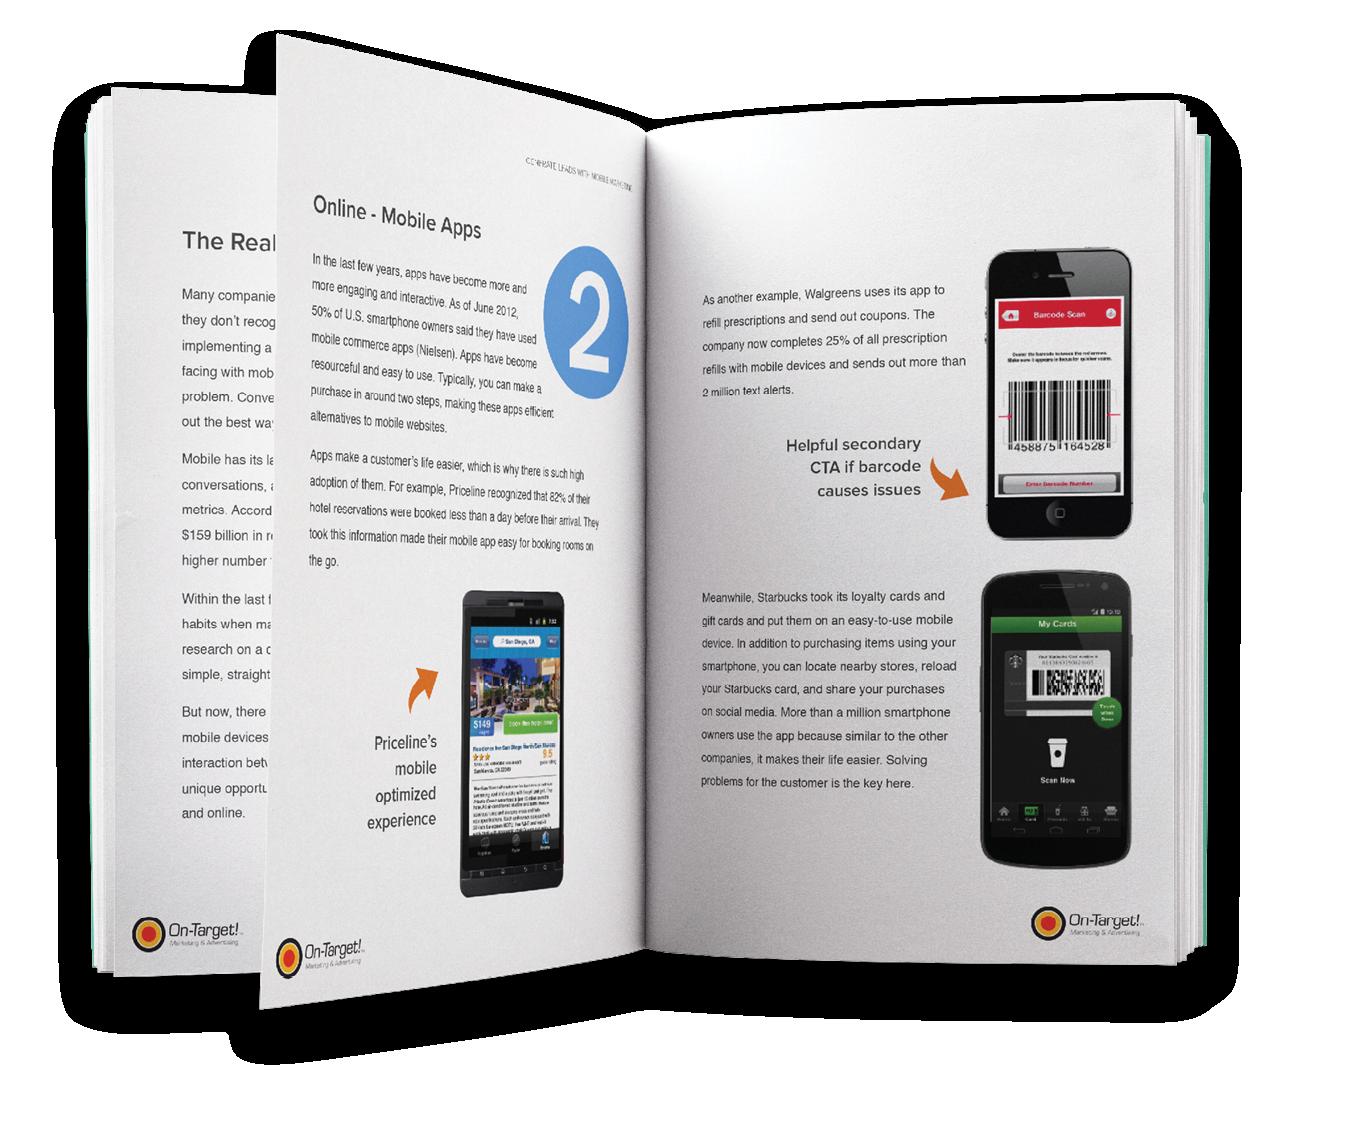 ebook-go-mobile-real-estate.png